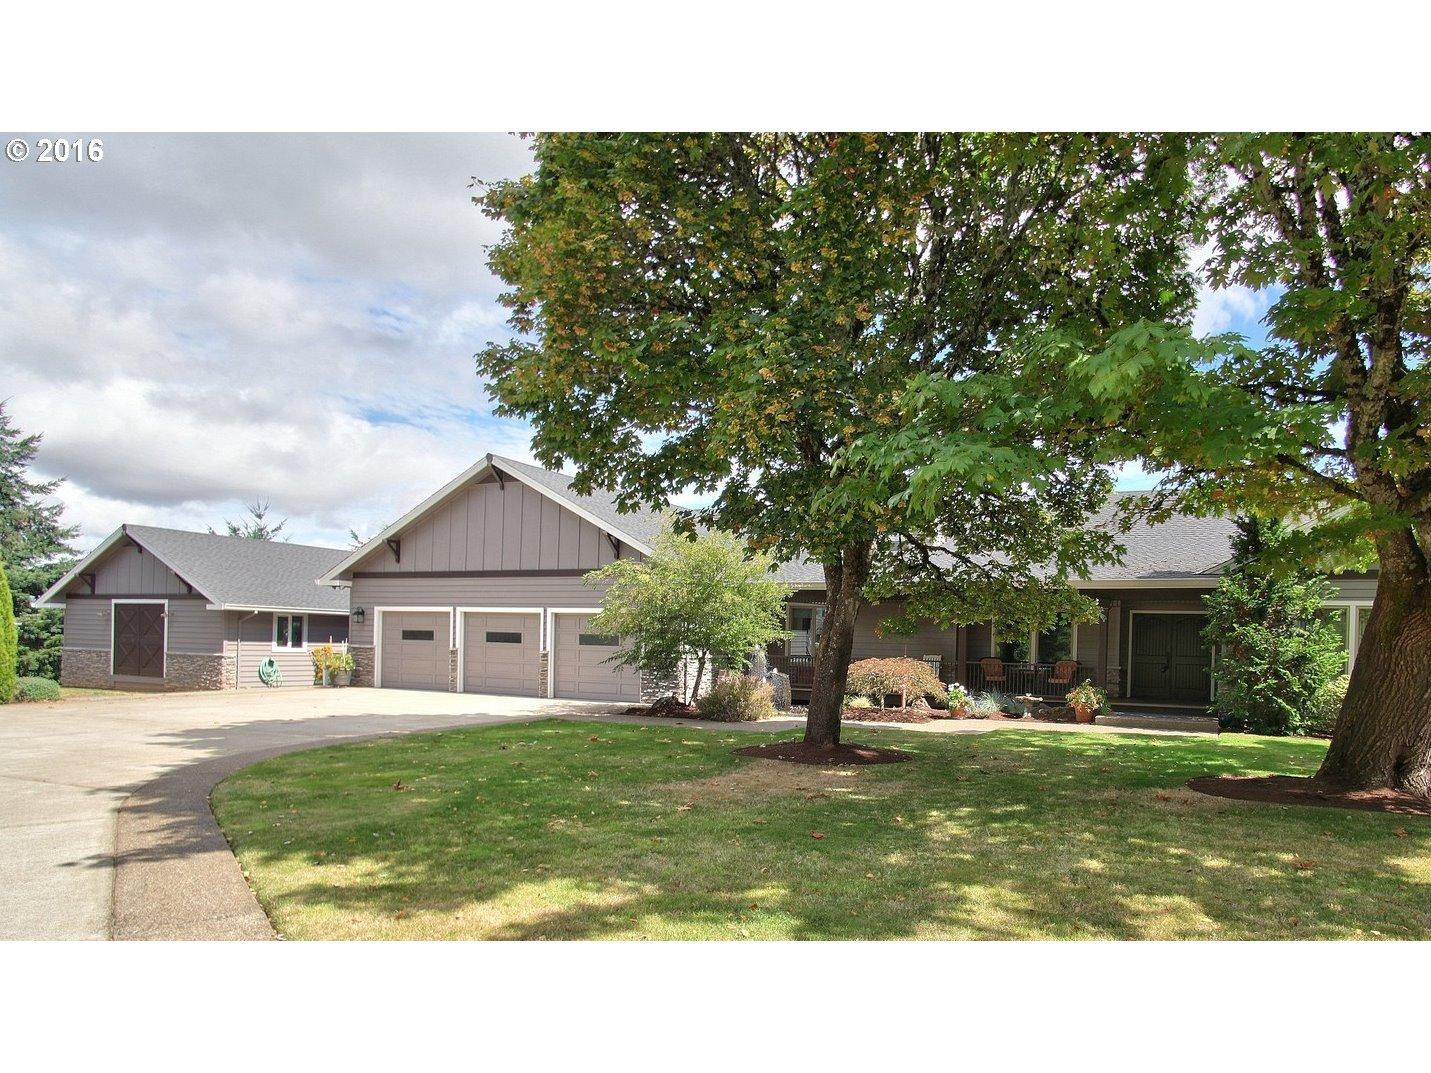 $1,075,000 - 4Br/3Ba -  for Sale in Bald Peak, Hillsboro